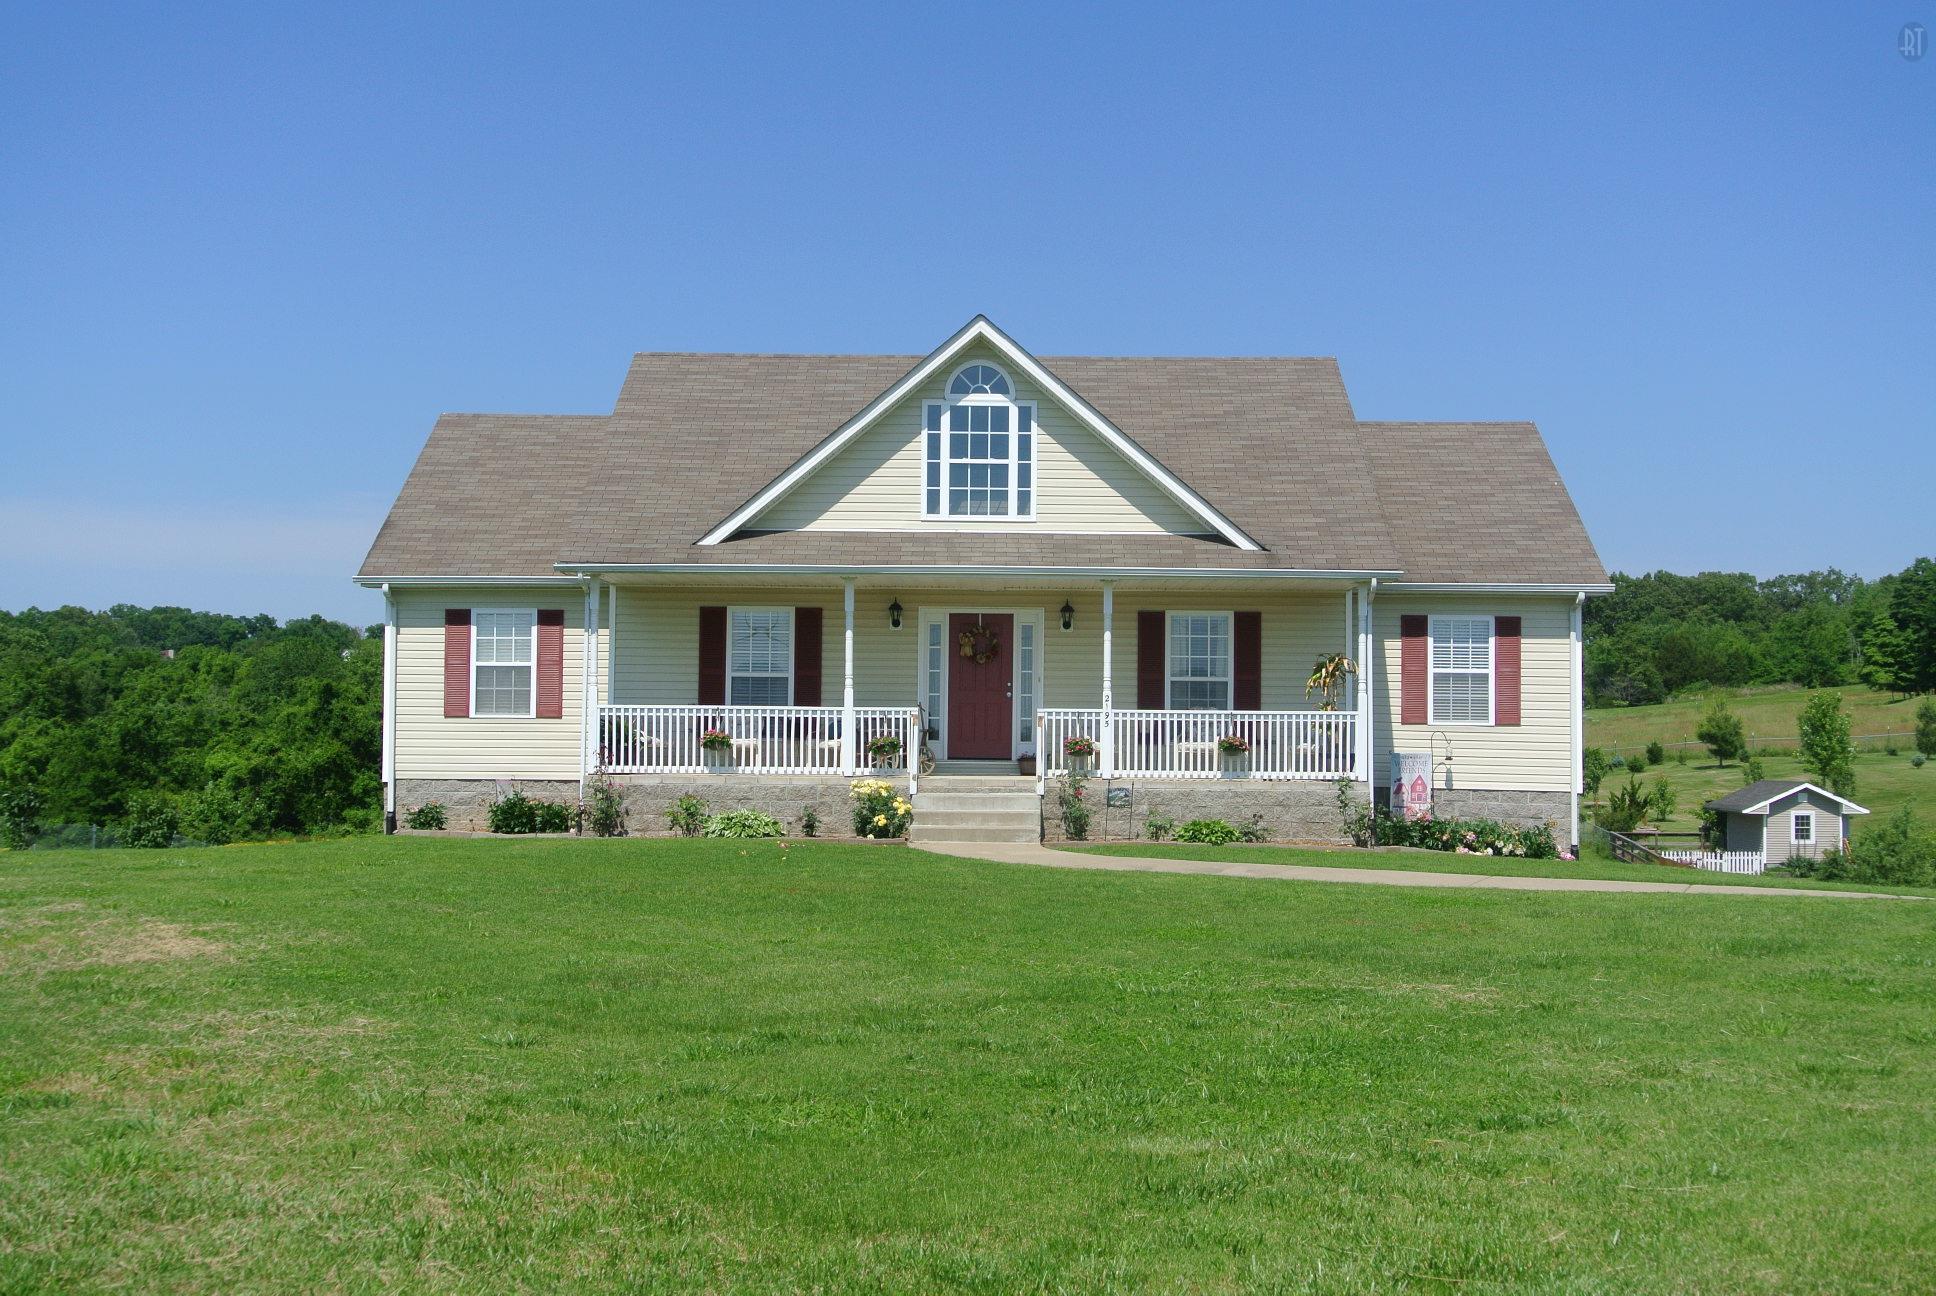 2195 Chester Harris Rd, Woodlawn, TN 37191